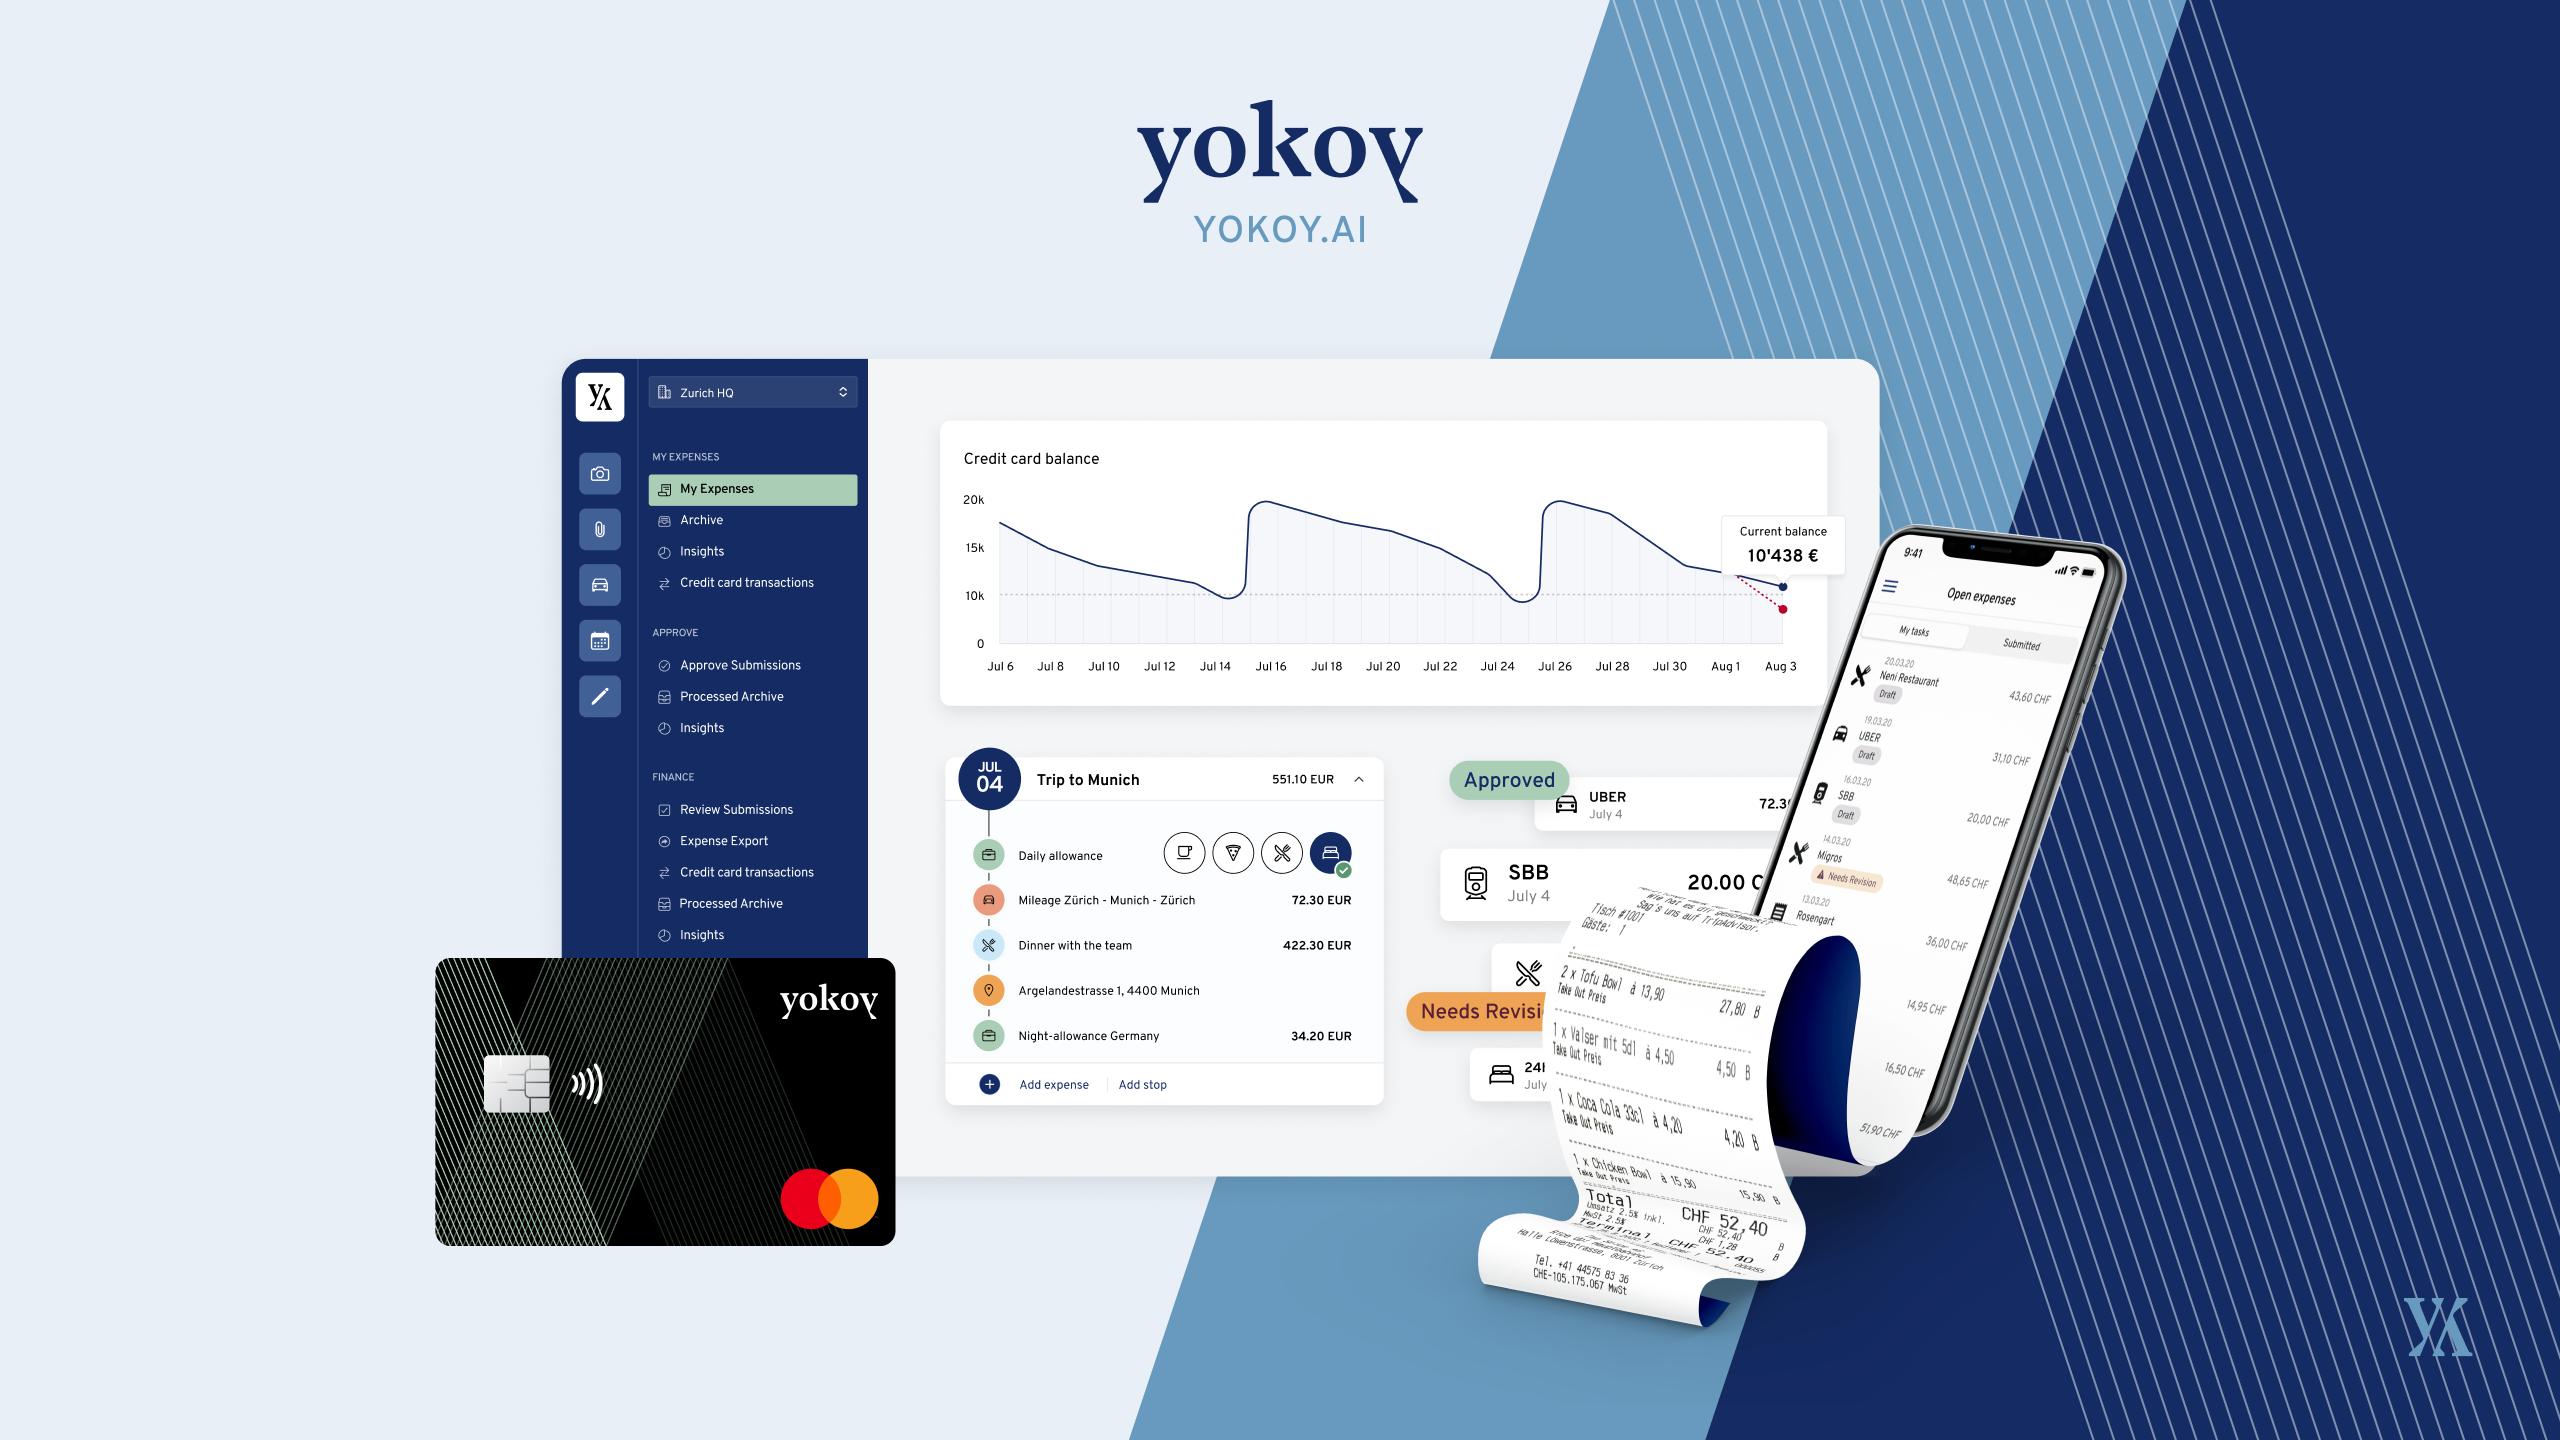 Yokoy Software - Yokoy Product Family